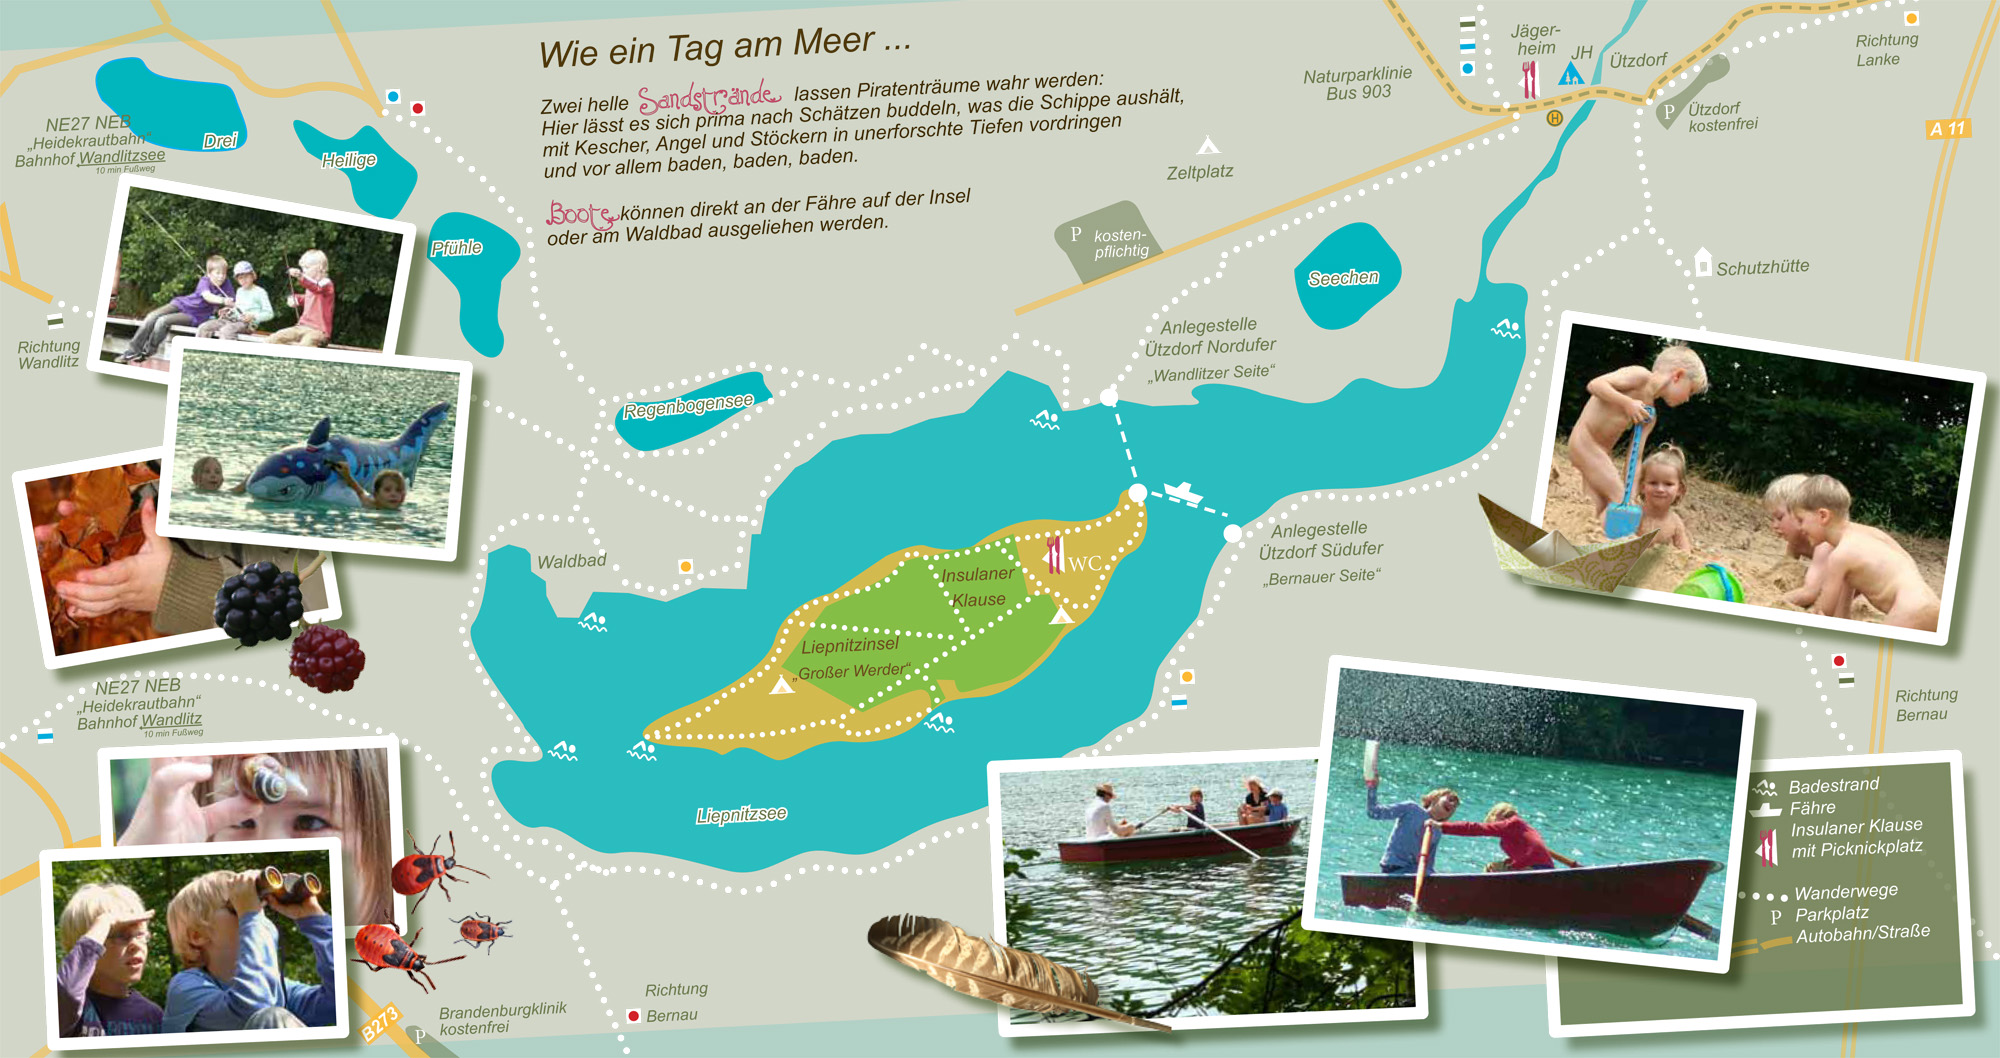 liepnitzsee-liepnitzinsel-fuer-familien-brandenburg-1